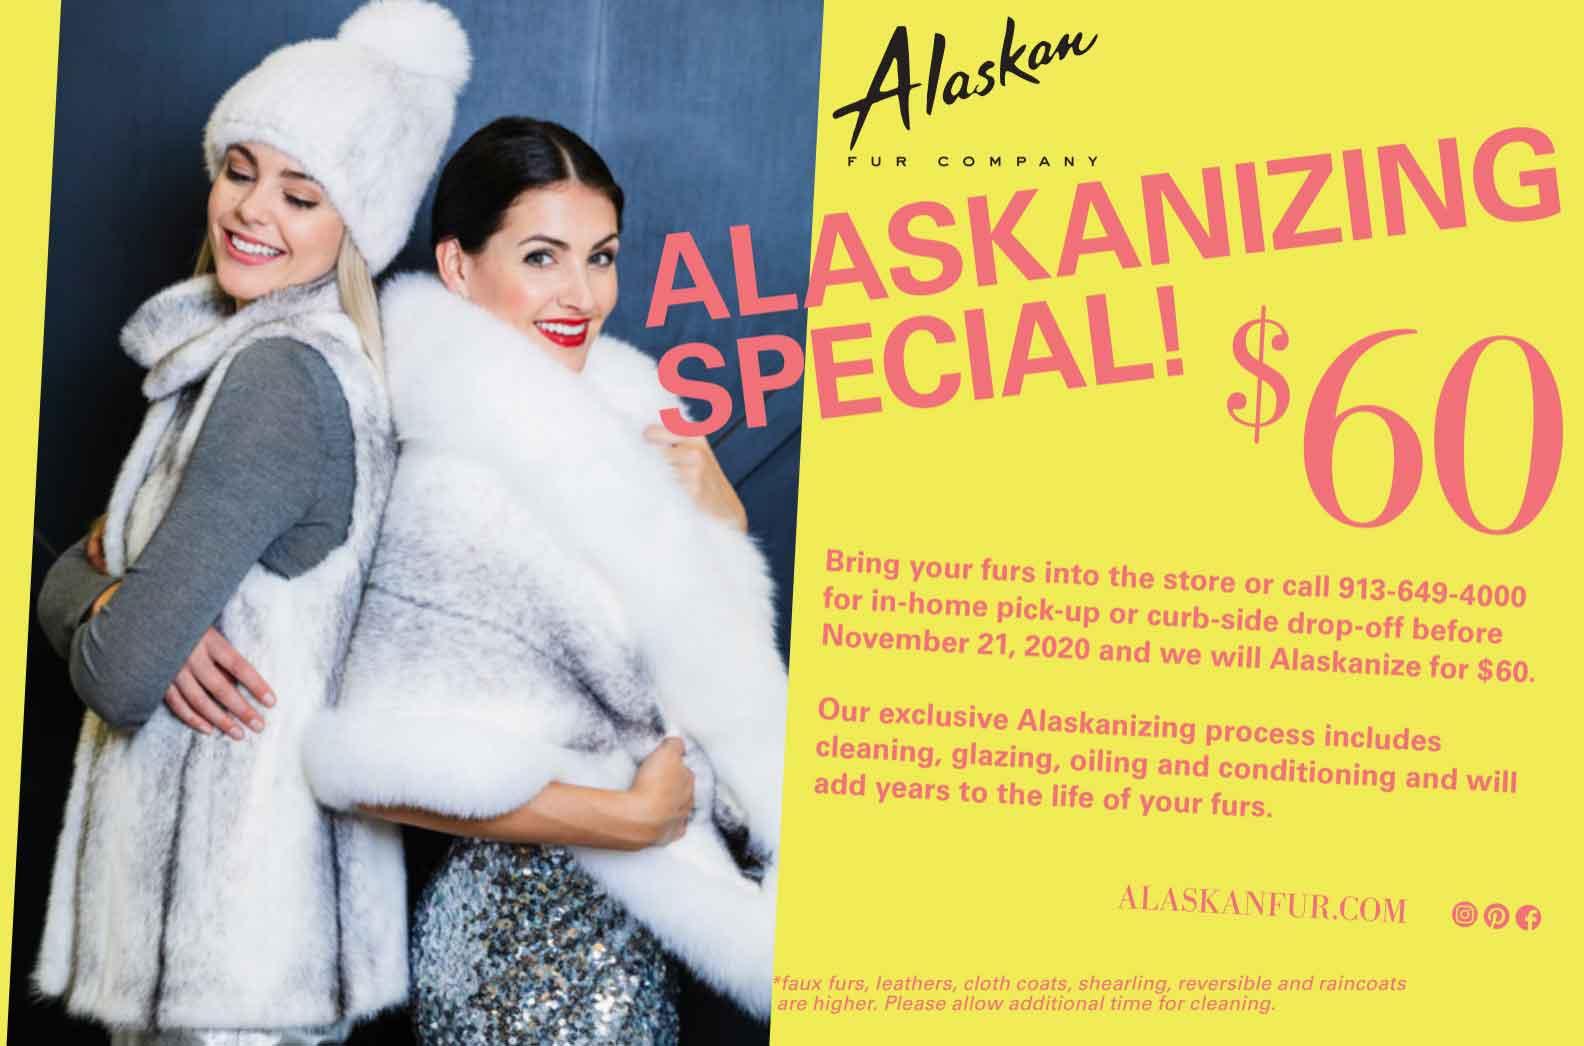 alaskanizing_special